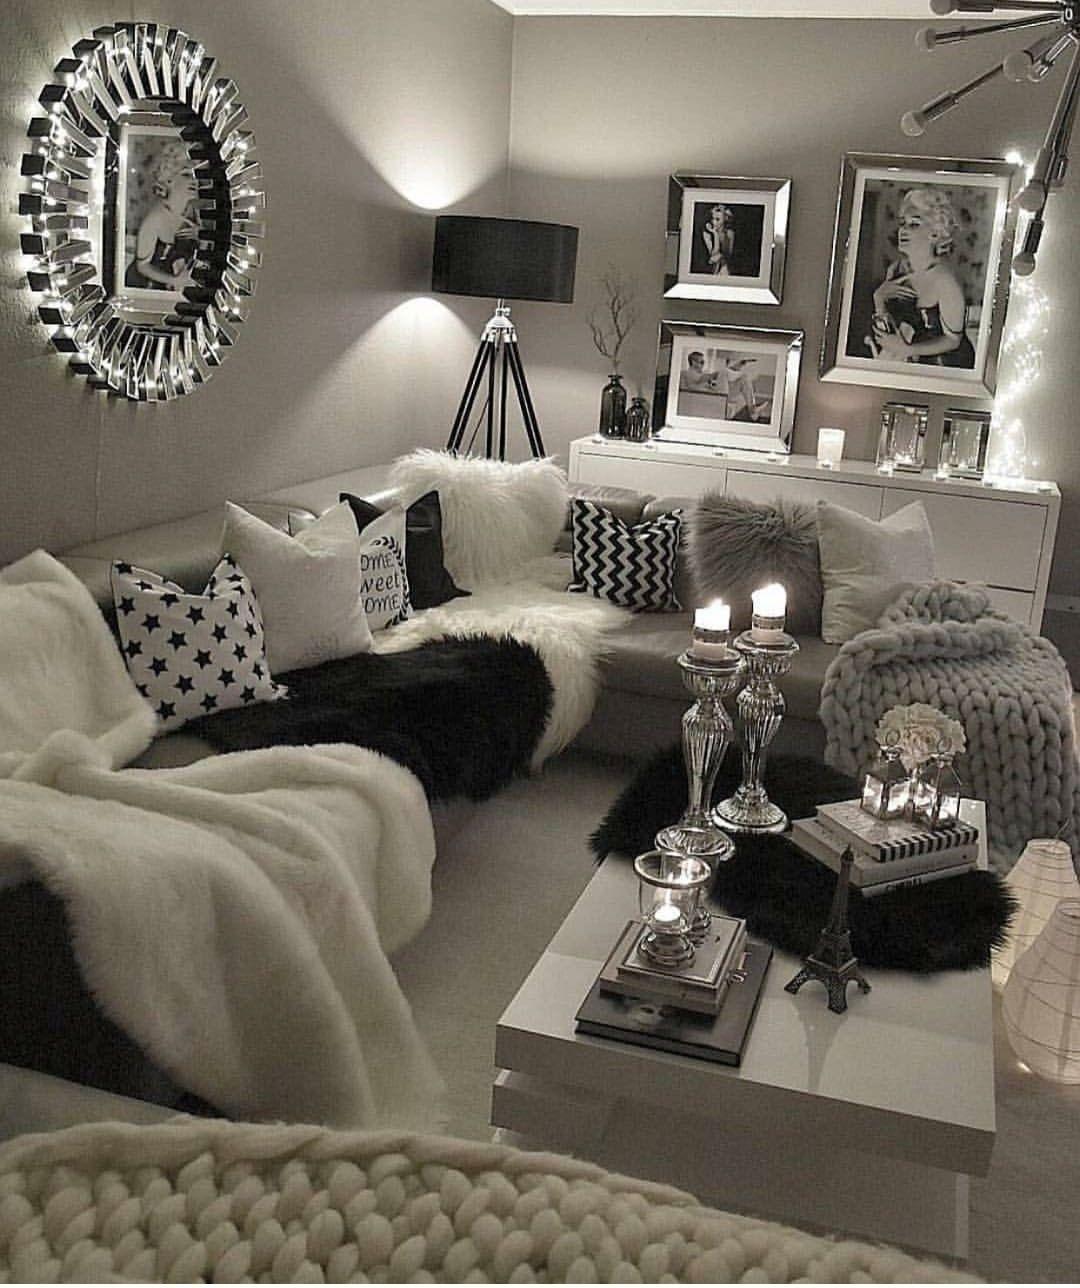 Grey Glam Living Room Ideas: 27 Rustic Farmhouse Living Room Decor Ideas For Your Home